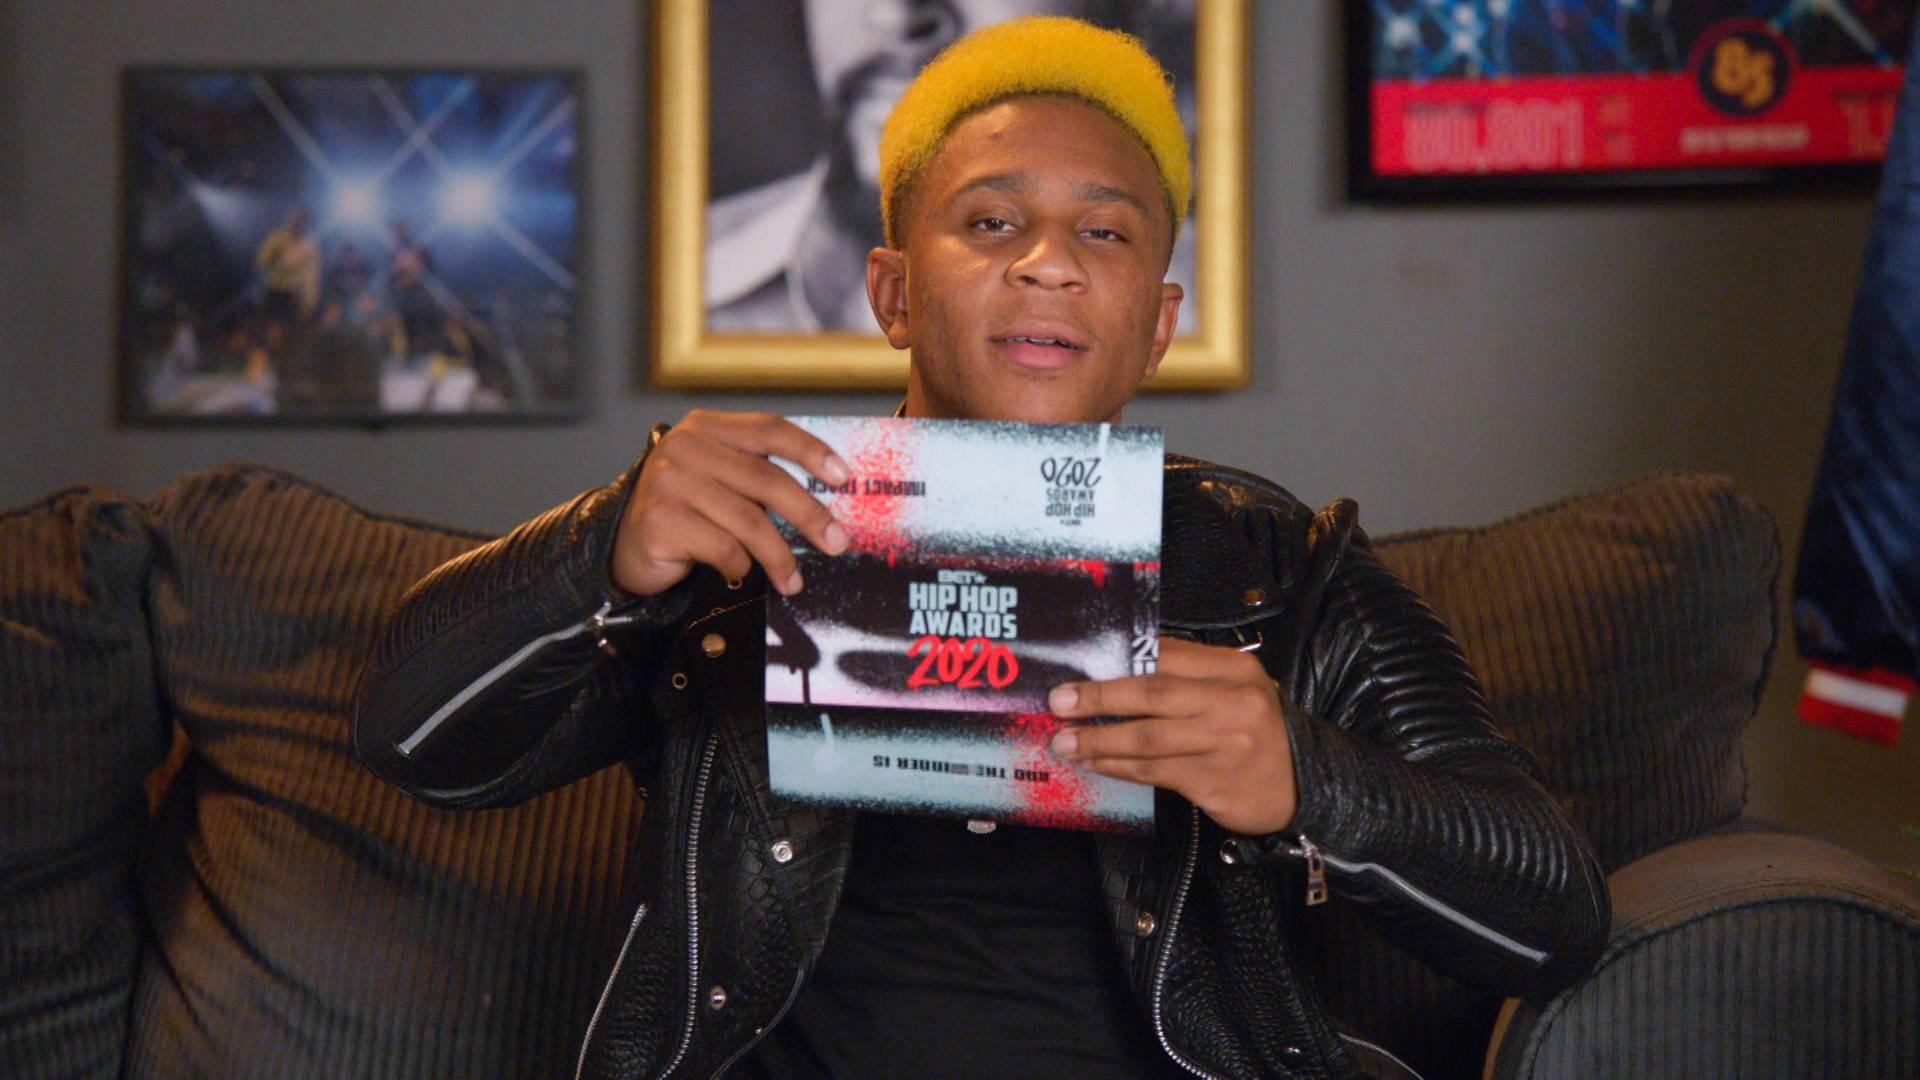 Hip Hop Awards 2020 | Show Highlights Gallery YelloPain | 1920x1080